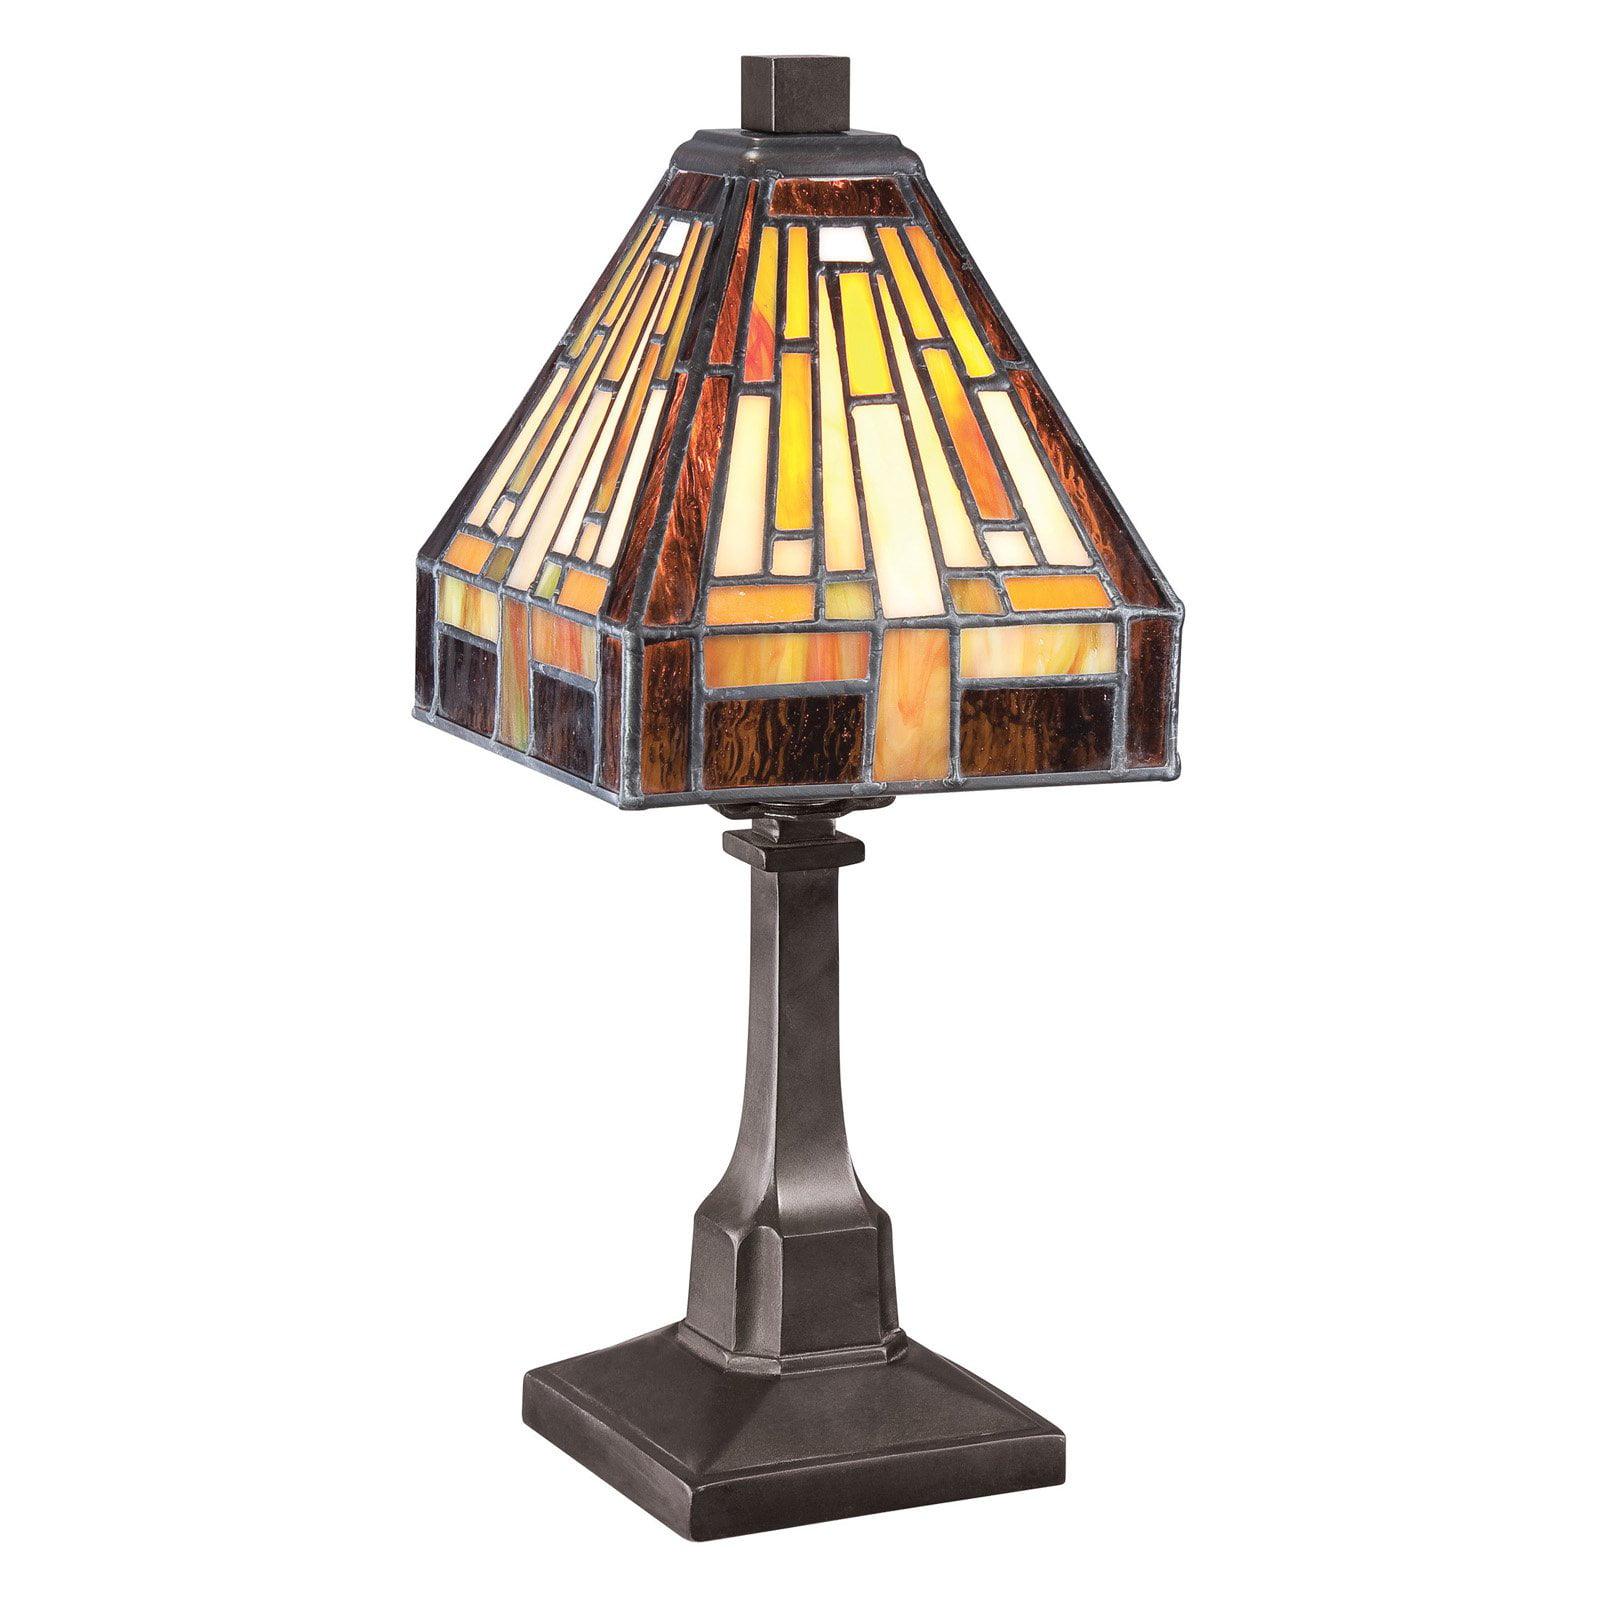 Quoizel Stephen TF1018TVB Table Lamp